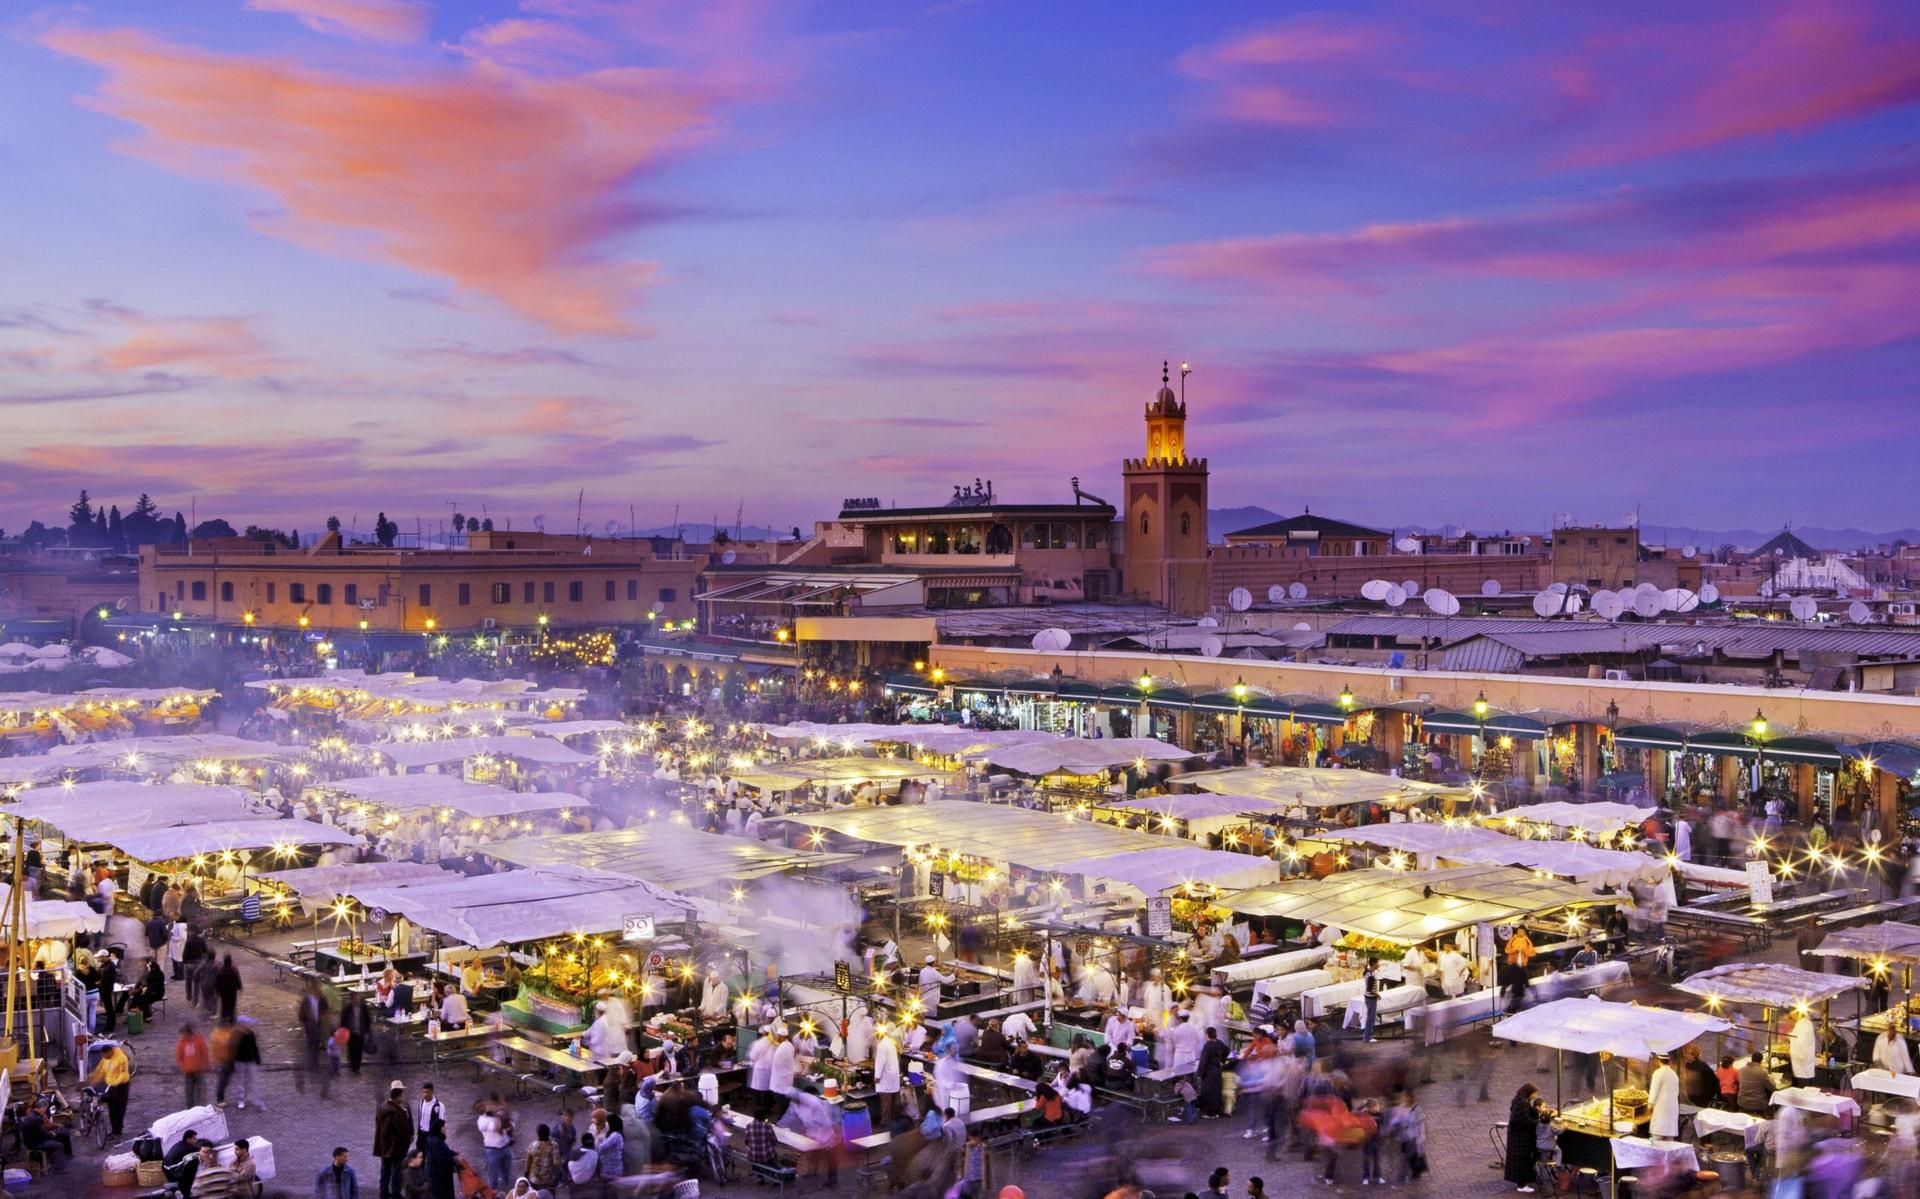 Active Treks Morocco - High Atlas and Marrakech trek